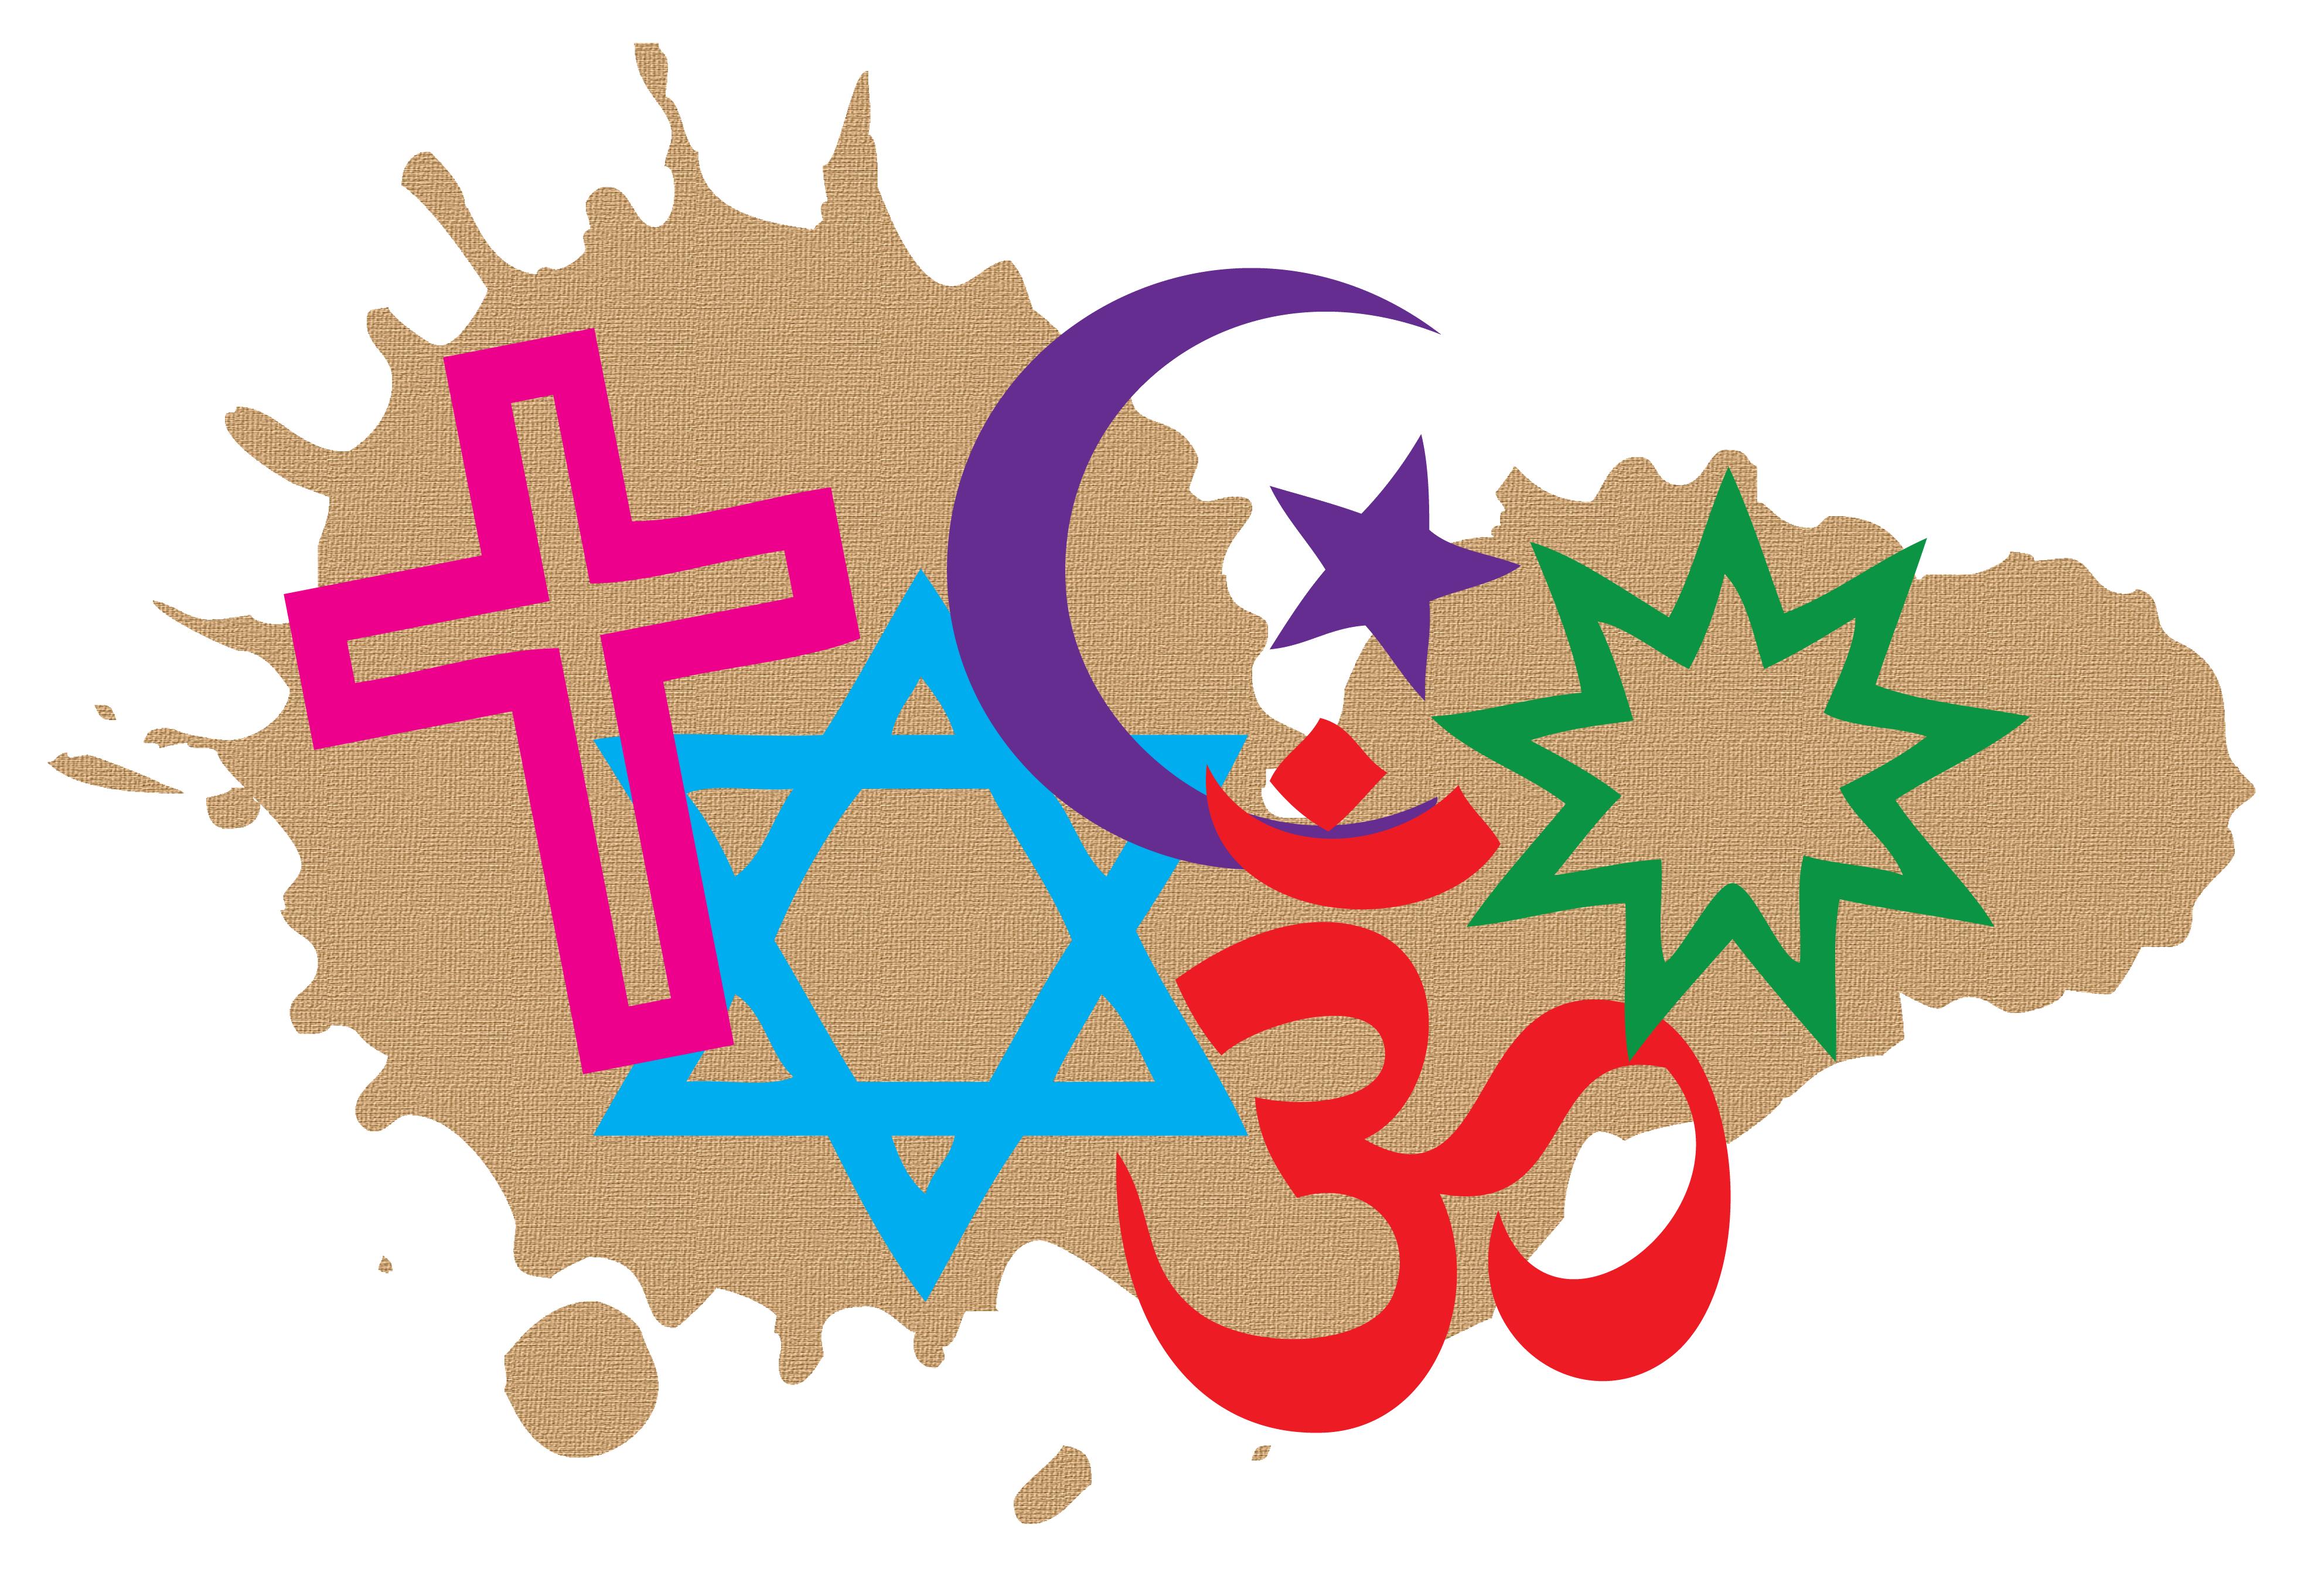 Free Religious Symbols Cliparts, Download Free Clip Art.